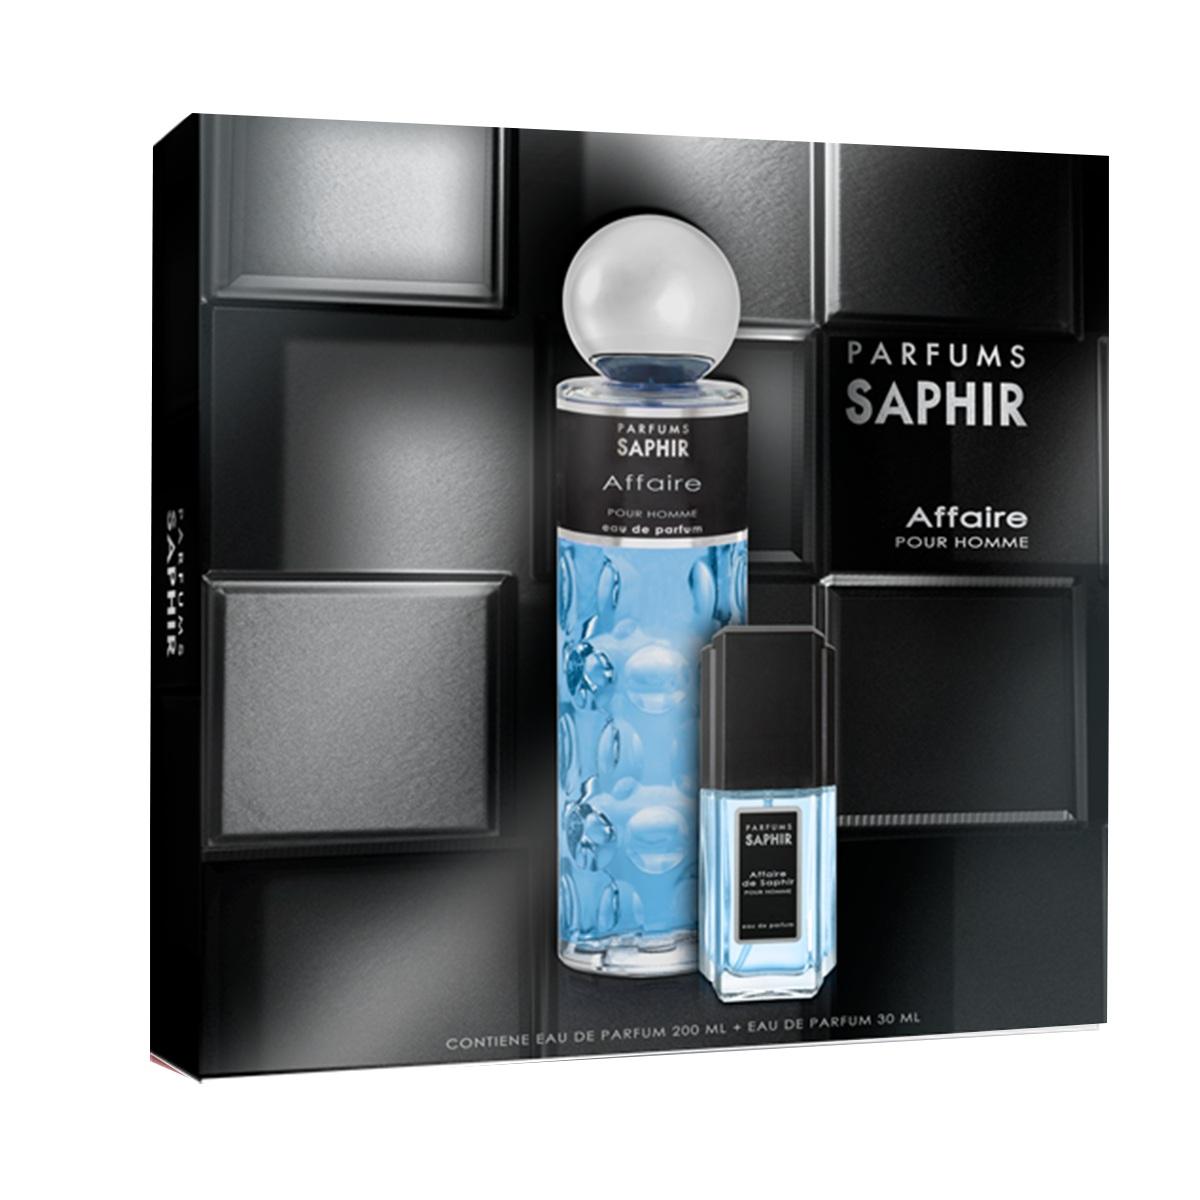 comprar barato oferta regalo descuento perfume hombre parfum 1000 ml